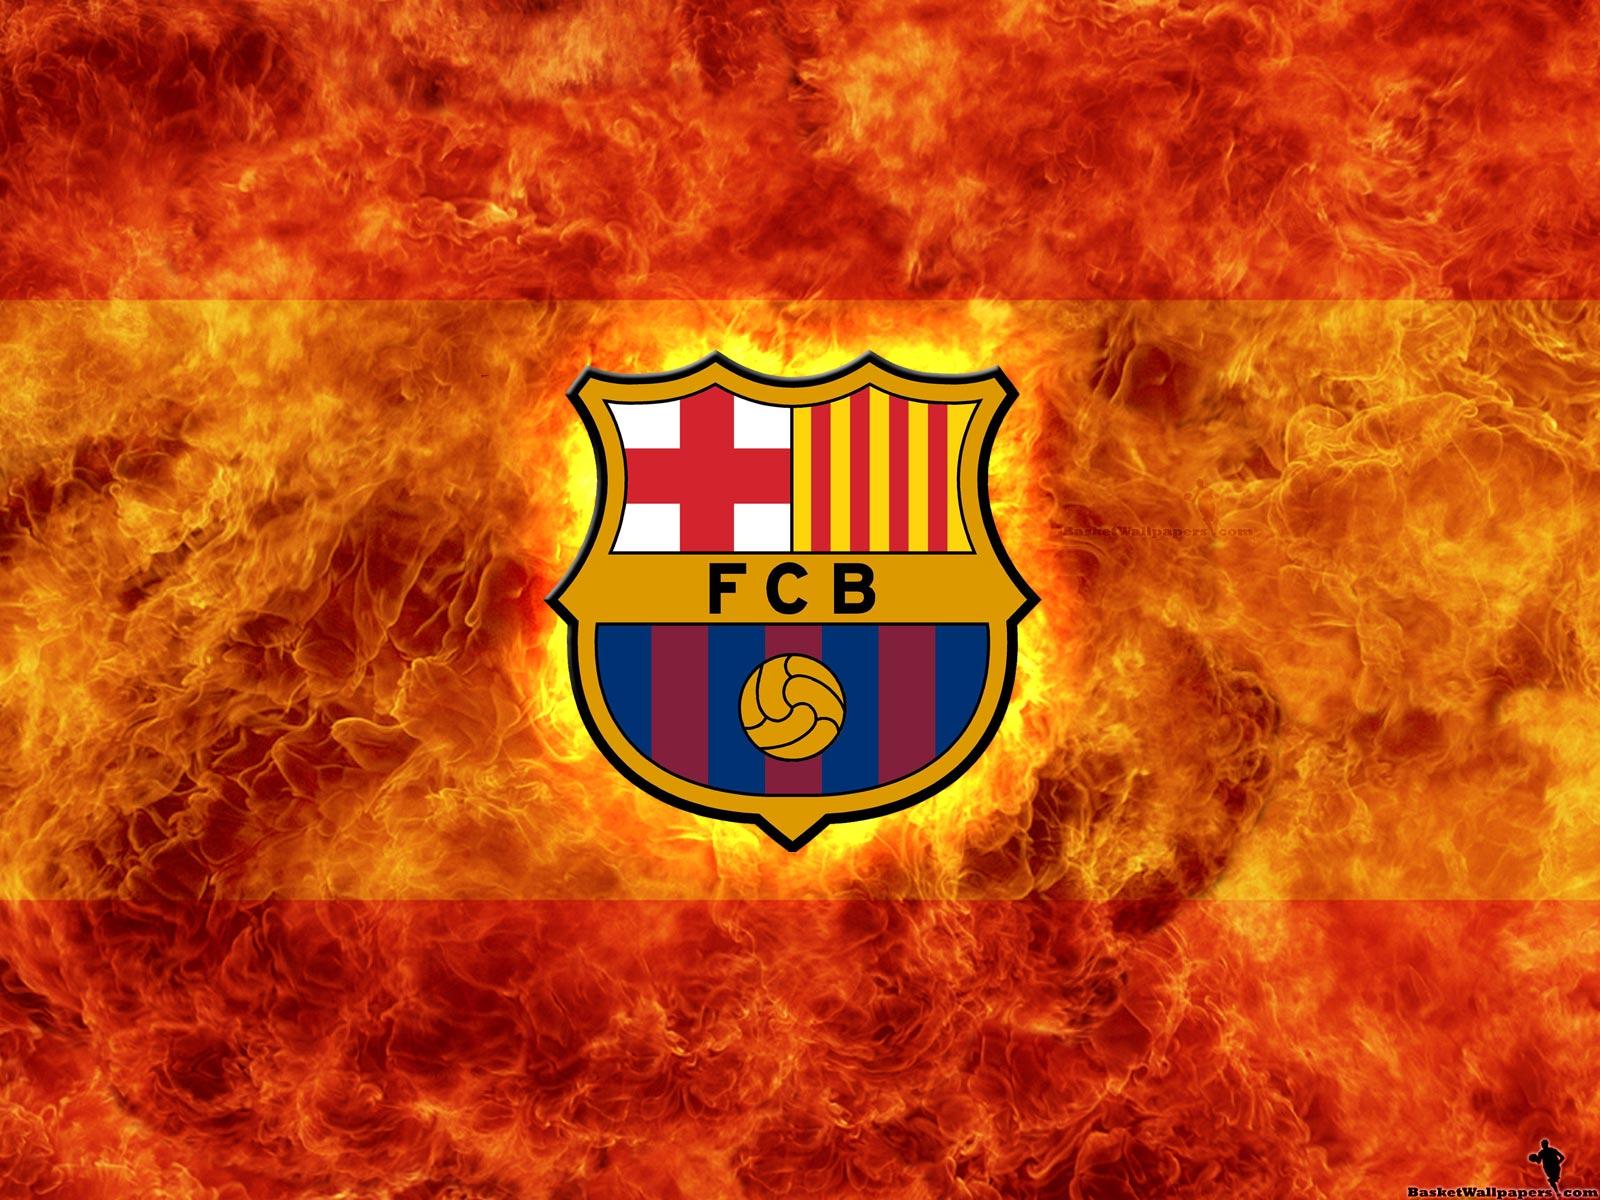 http://3.bp.blogspot.com/-XuD6FQTo01I/TaixfUdeoeI/AAAAAAAAAFg/_CDywFw37t4/s1600/Regal-FC-Barcelona-Wallpaper.jpg